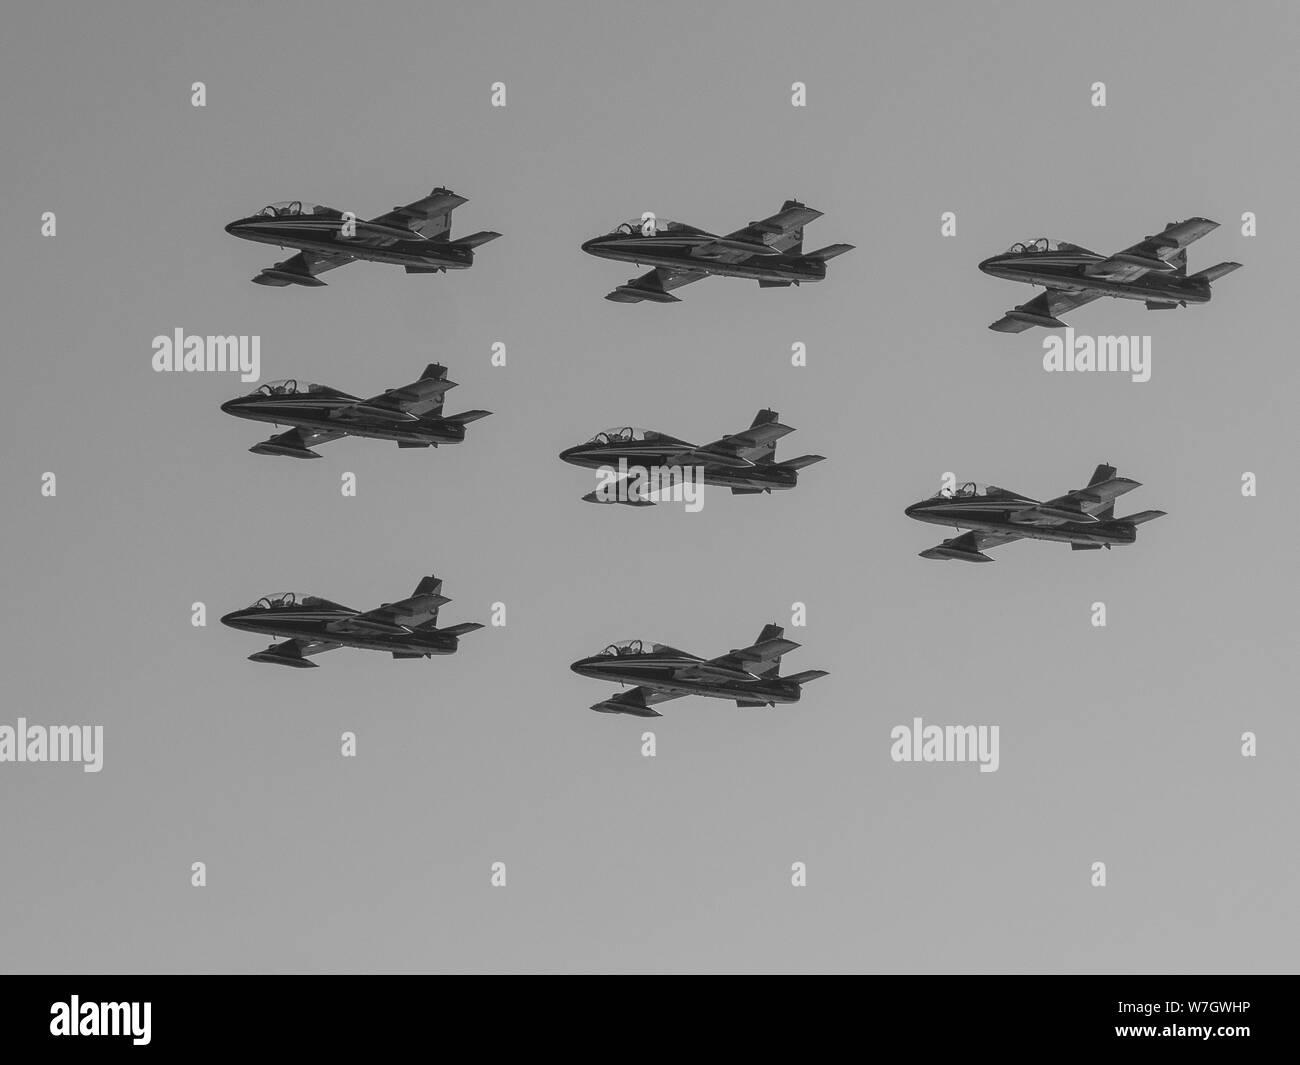 Acrobatic air show in ladispoli, italy Stock Photo